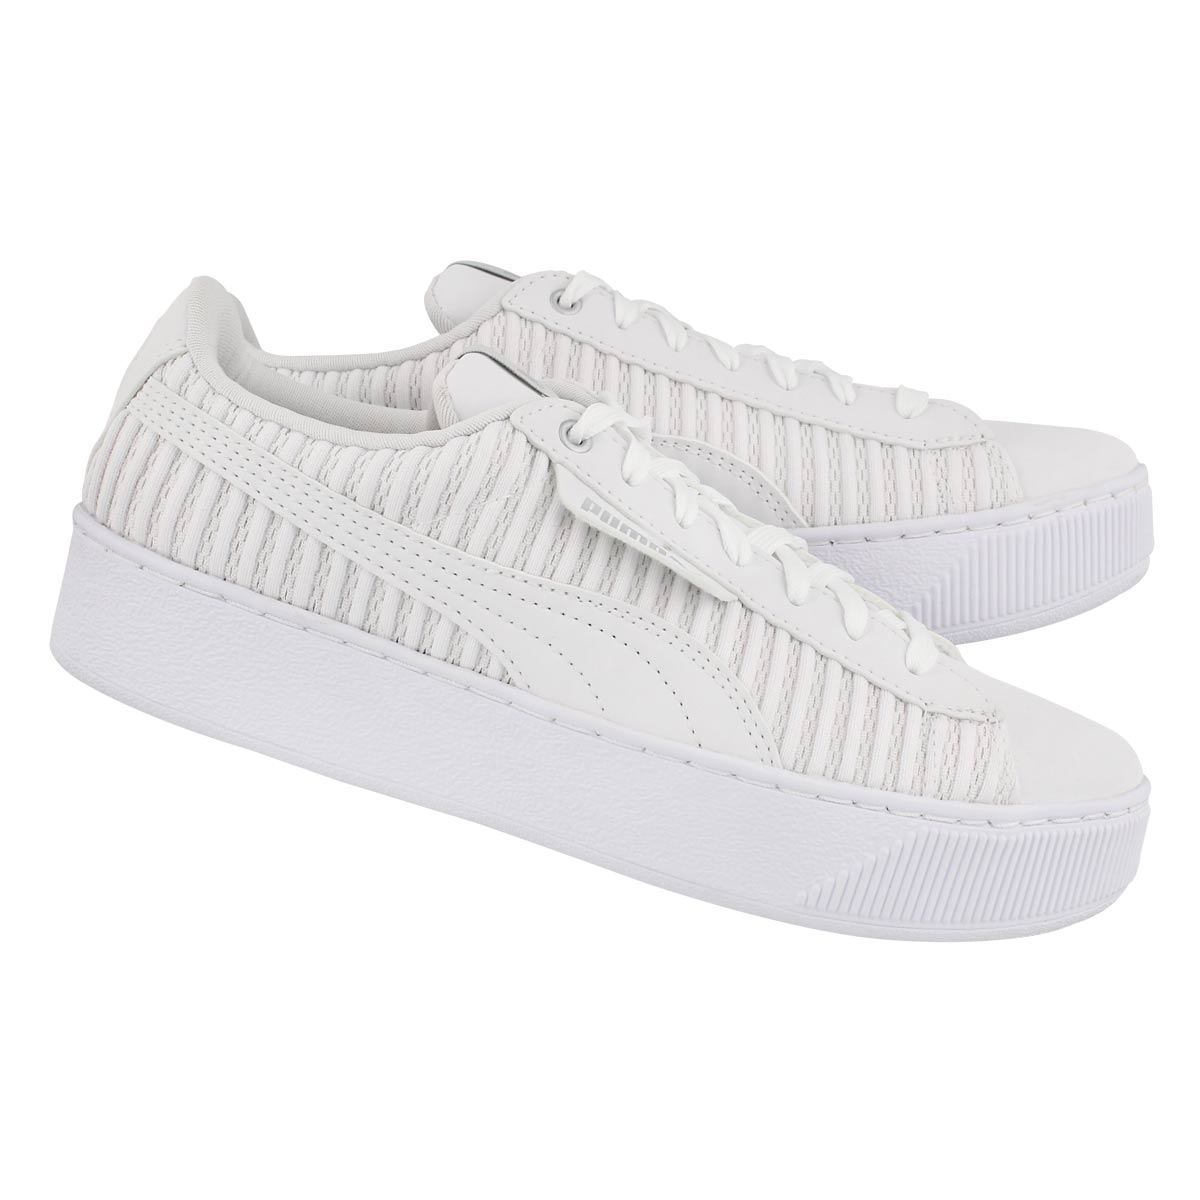 Lds Puma Vikky Platform wht/wht sneaker